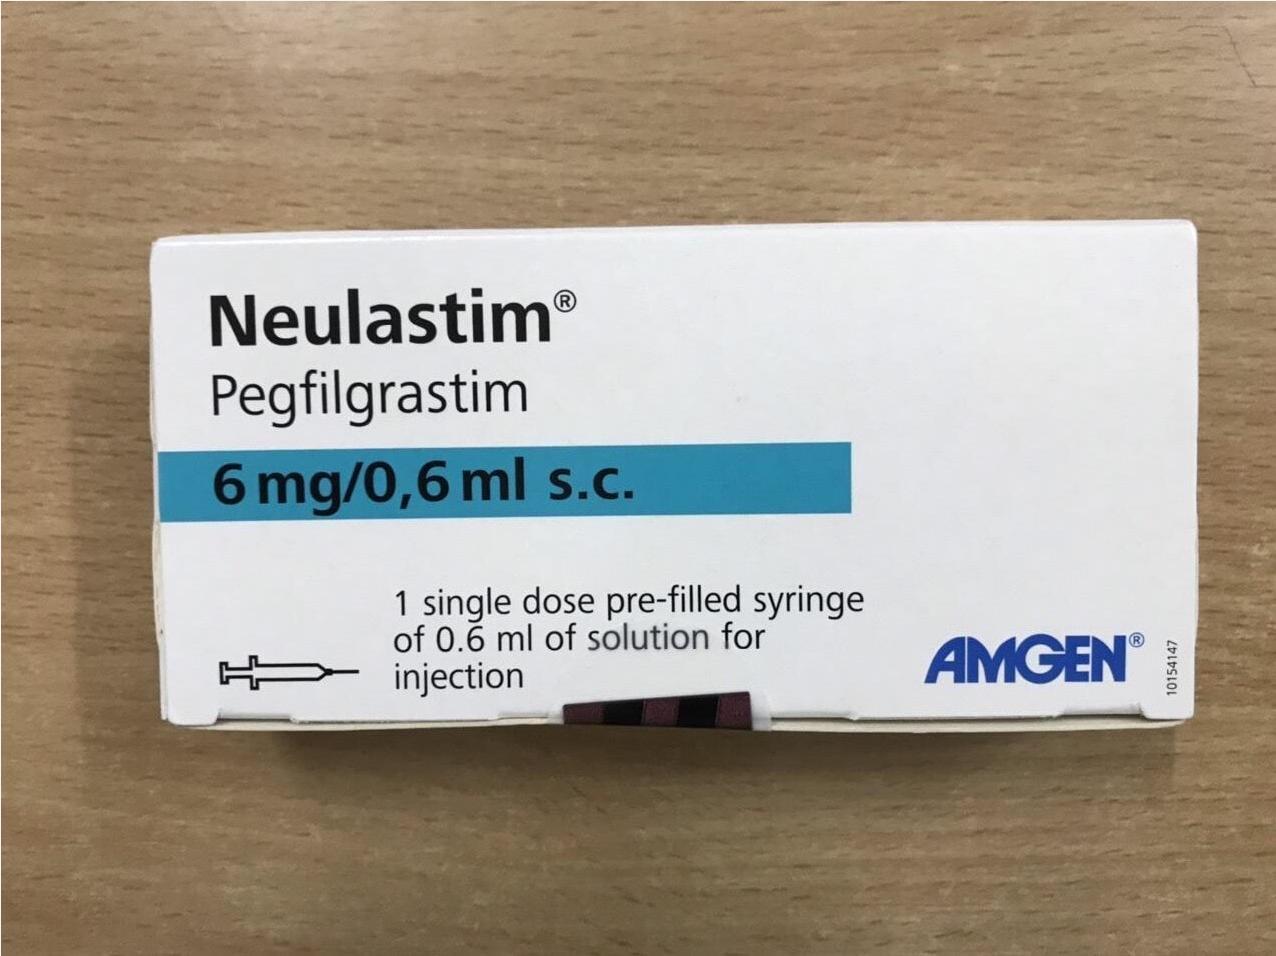 Thuốc Neulastim pegfilgrastim giá bao nhiêu mua ở đâu?